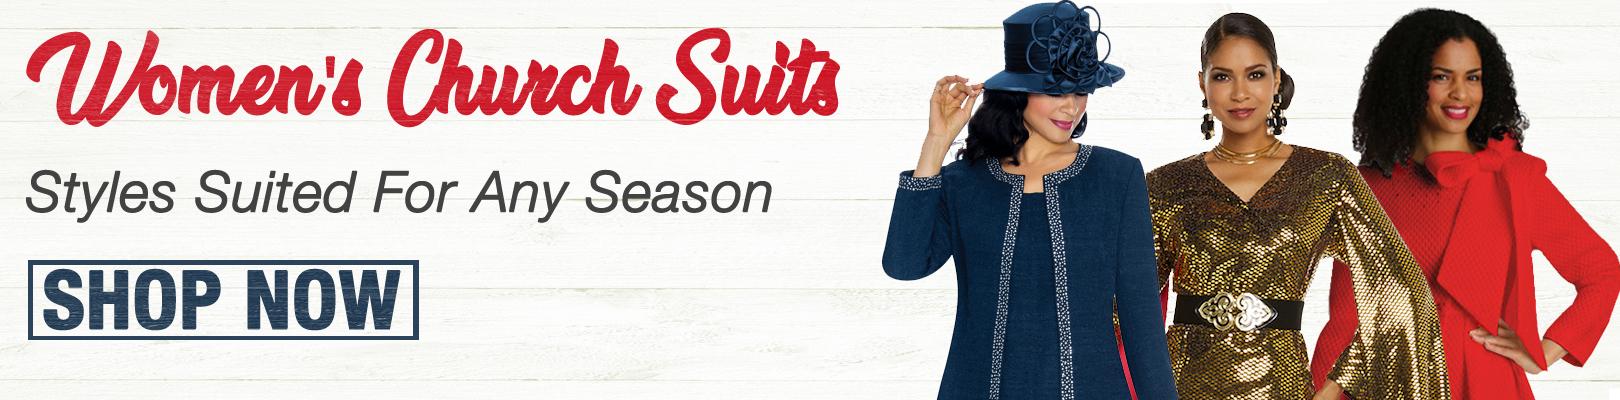 Womens Suits,Womens Dresses,Womens Hats,Plus Size Womens Suits